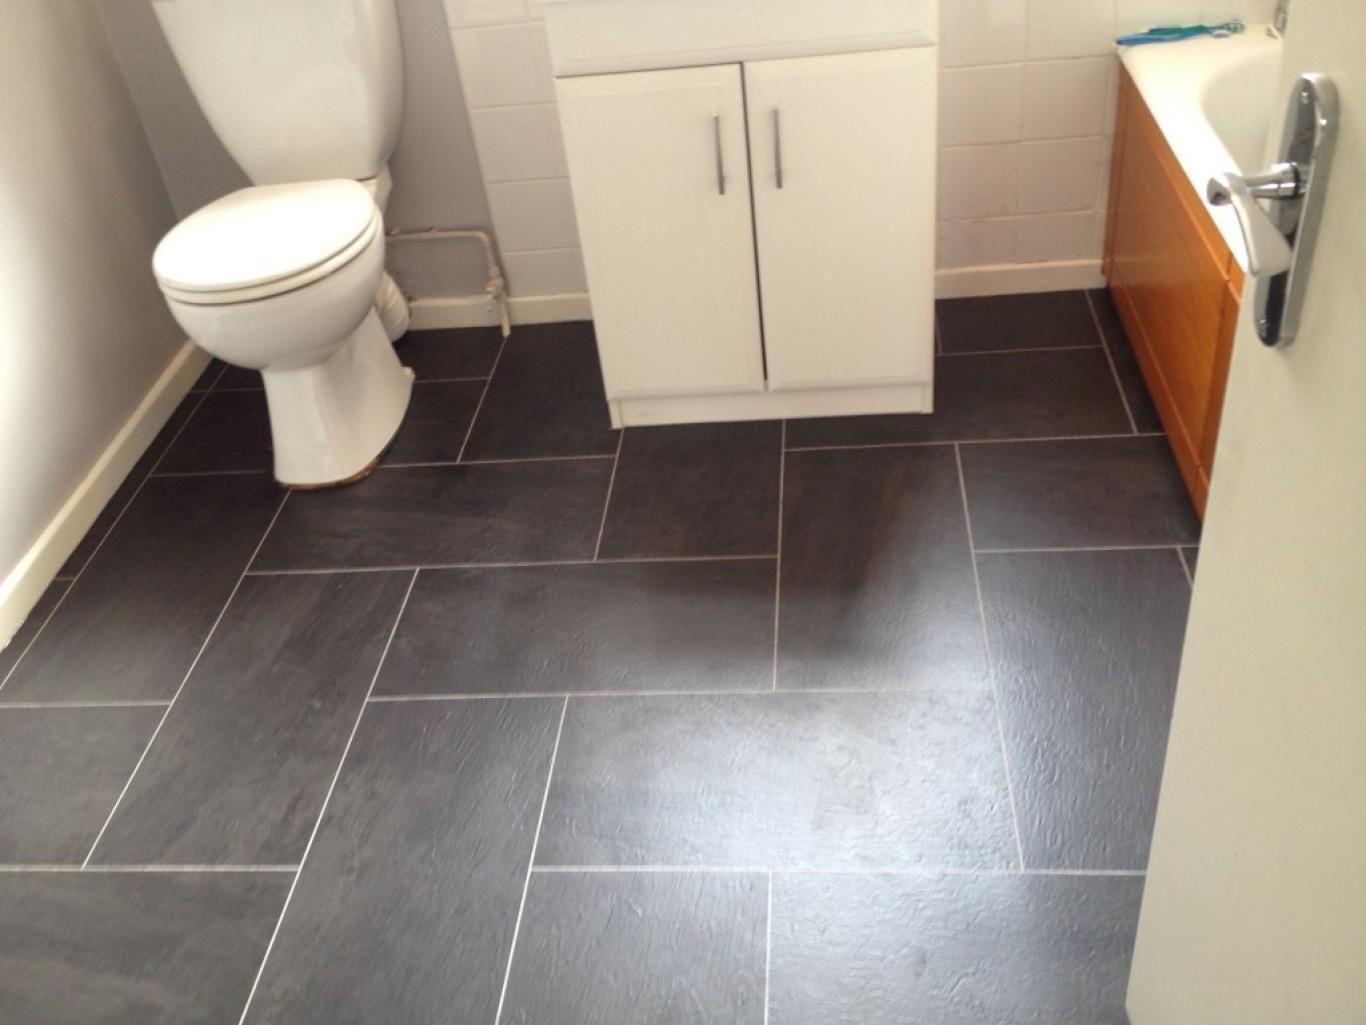 Bathroom Floor Tile Ideas Bathroom: Bathroom Floor Tile Patterns For Small Bathroom Bathroom Floor Tile Patterns WMVSZWHMV